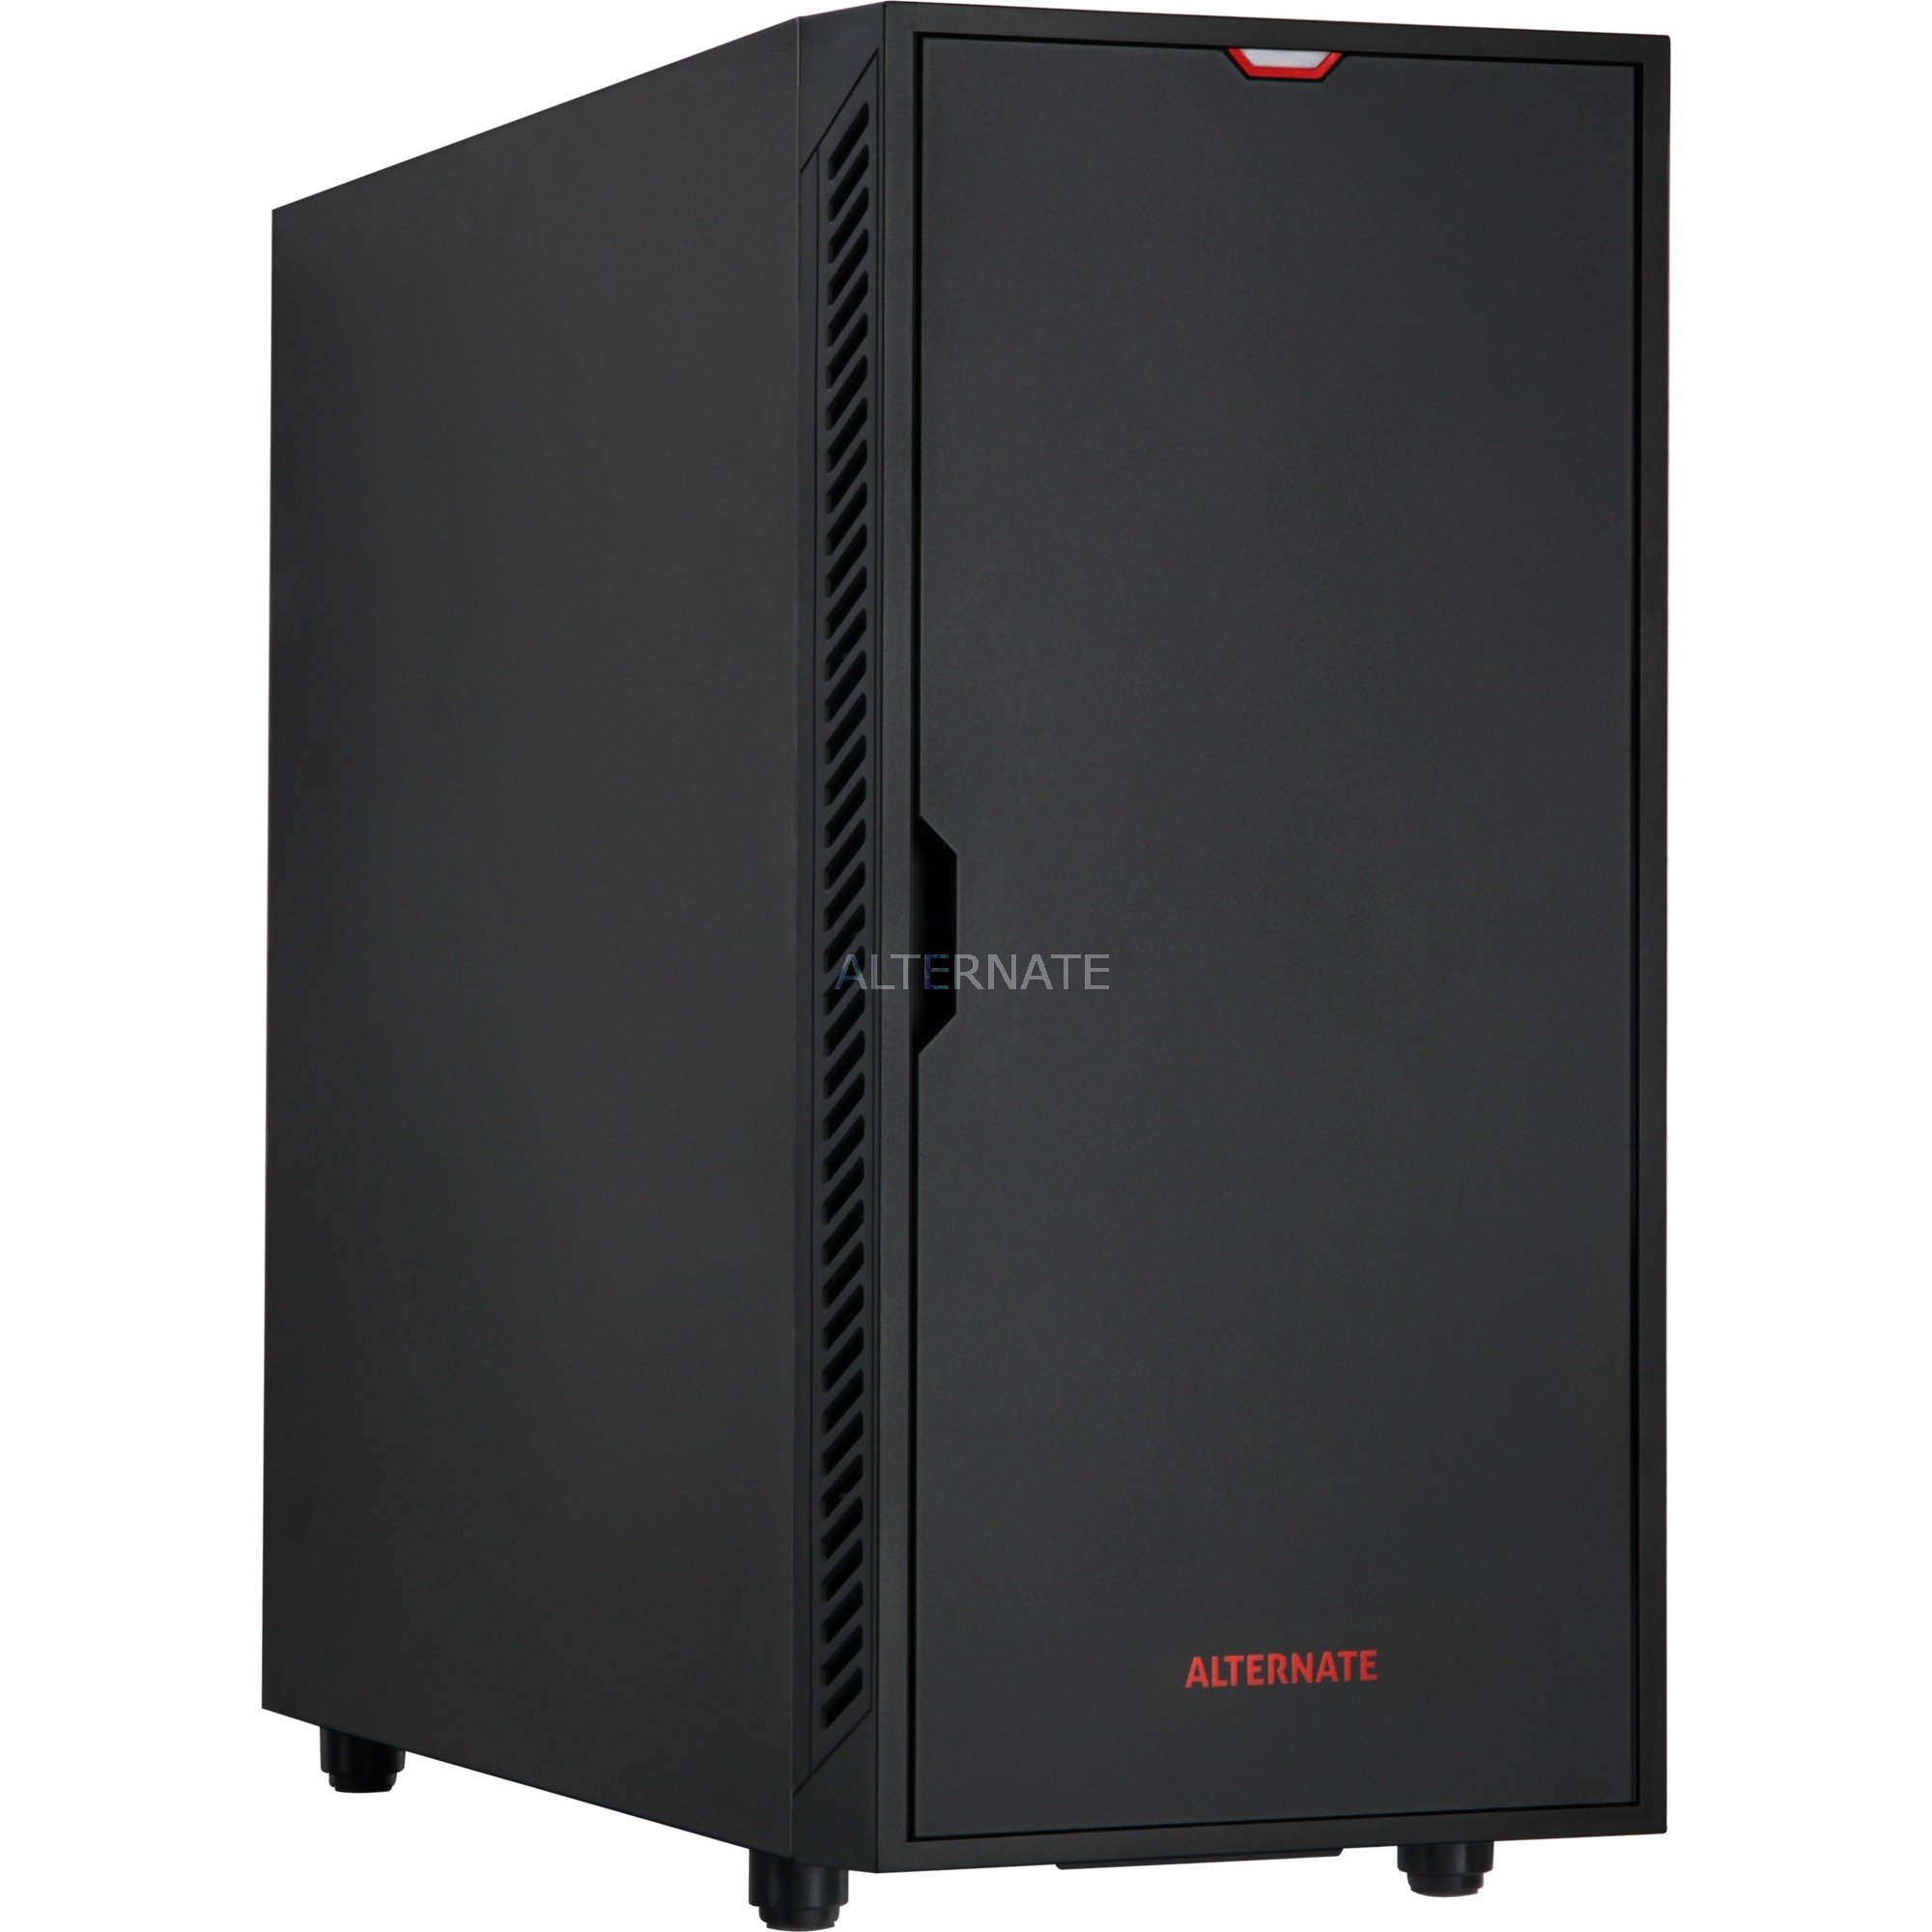 RAVEN 2200G, PC completo